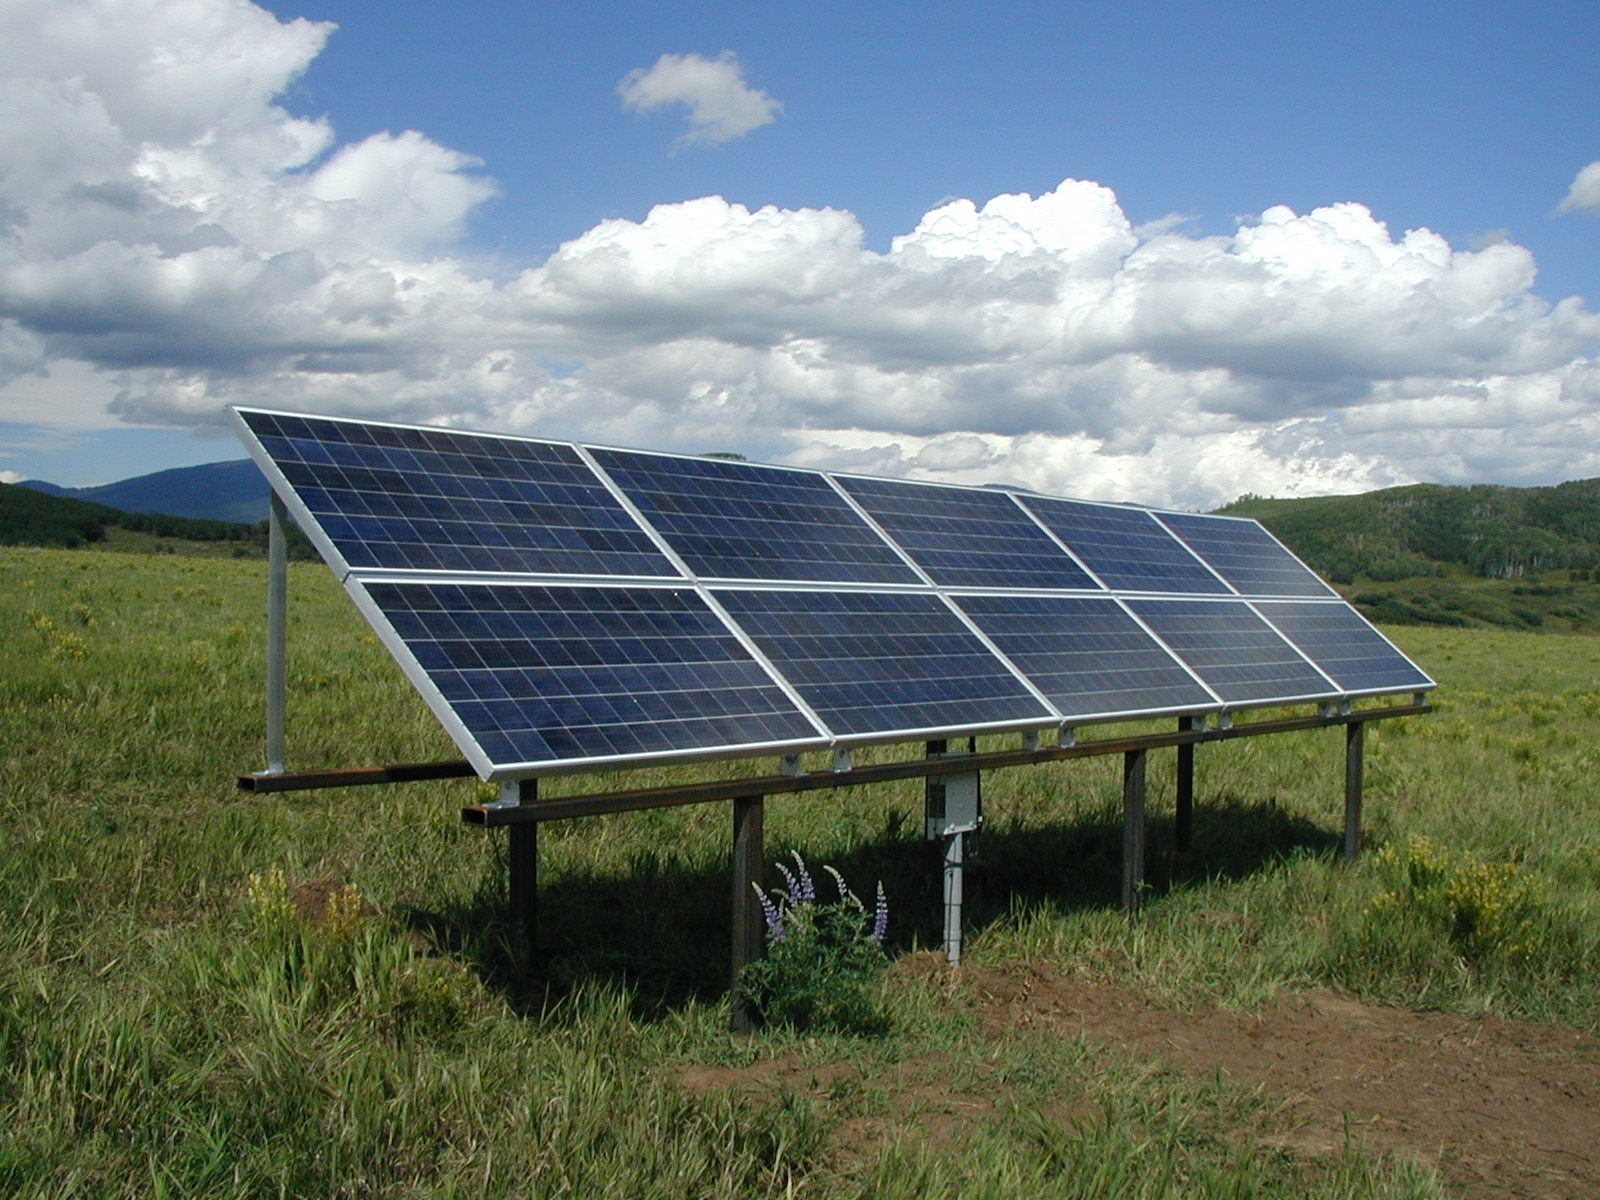 alternative-power-enterprises-solar-installation-projects7.jpg